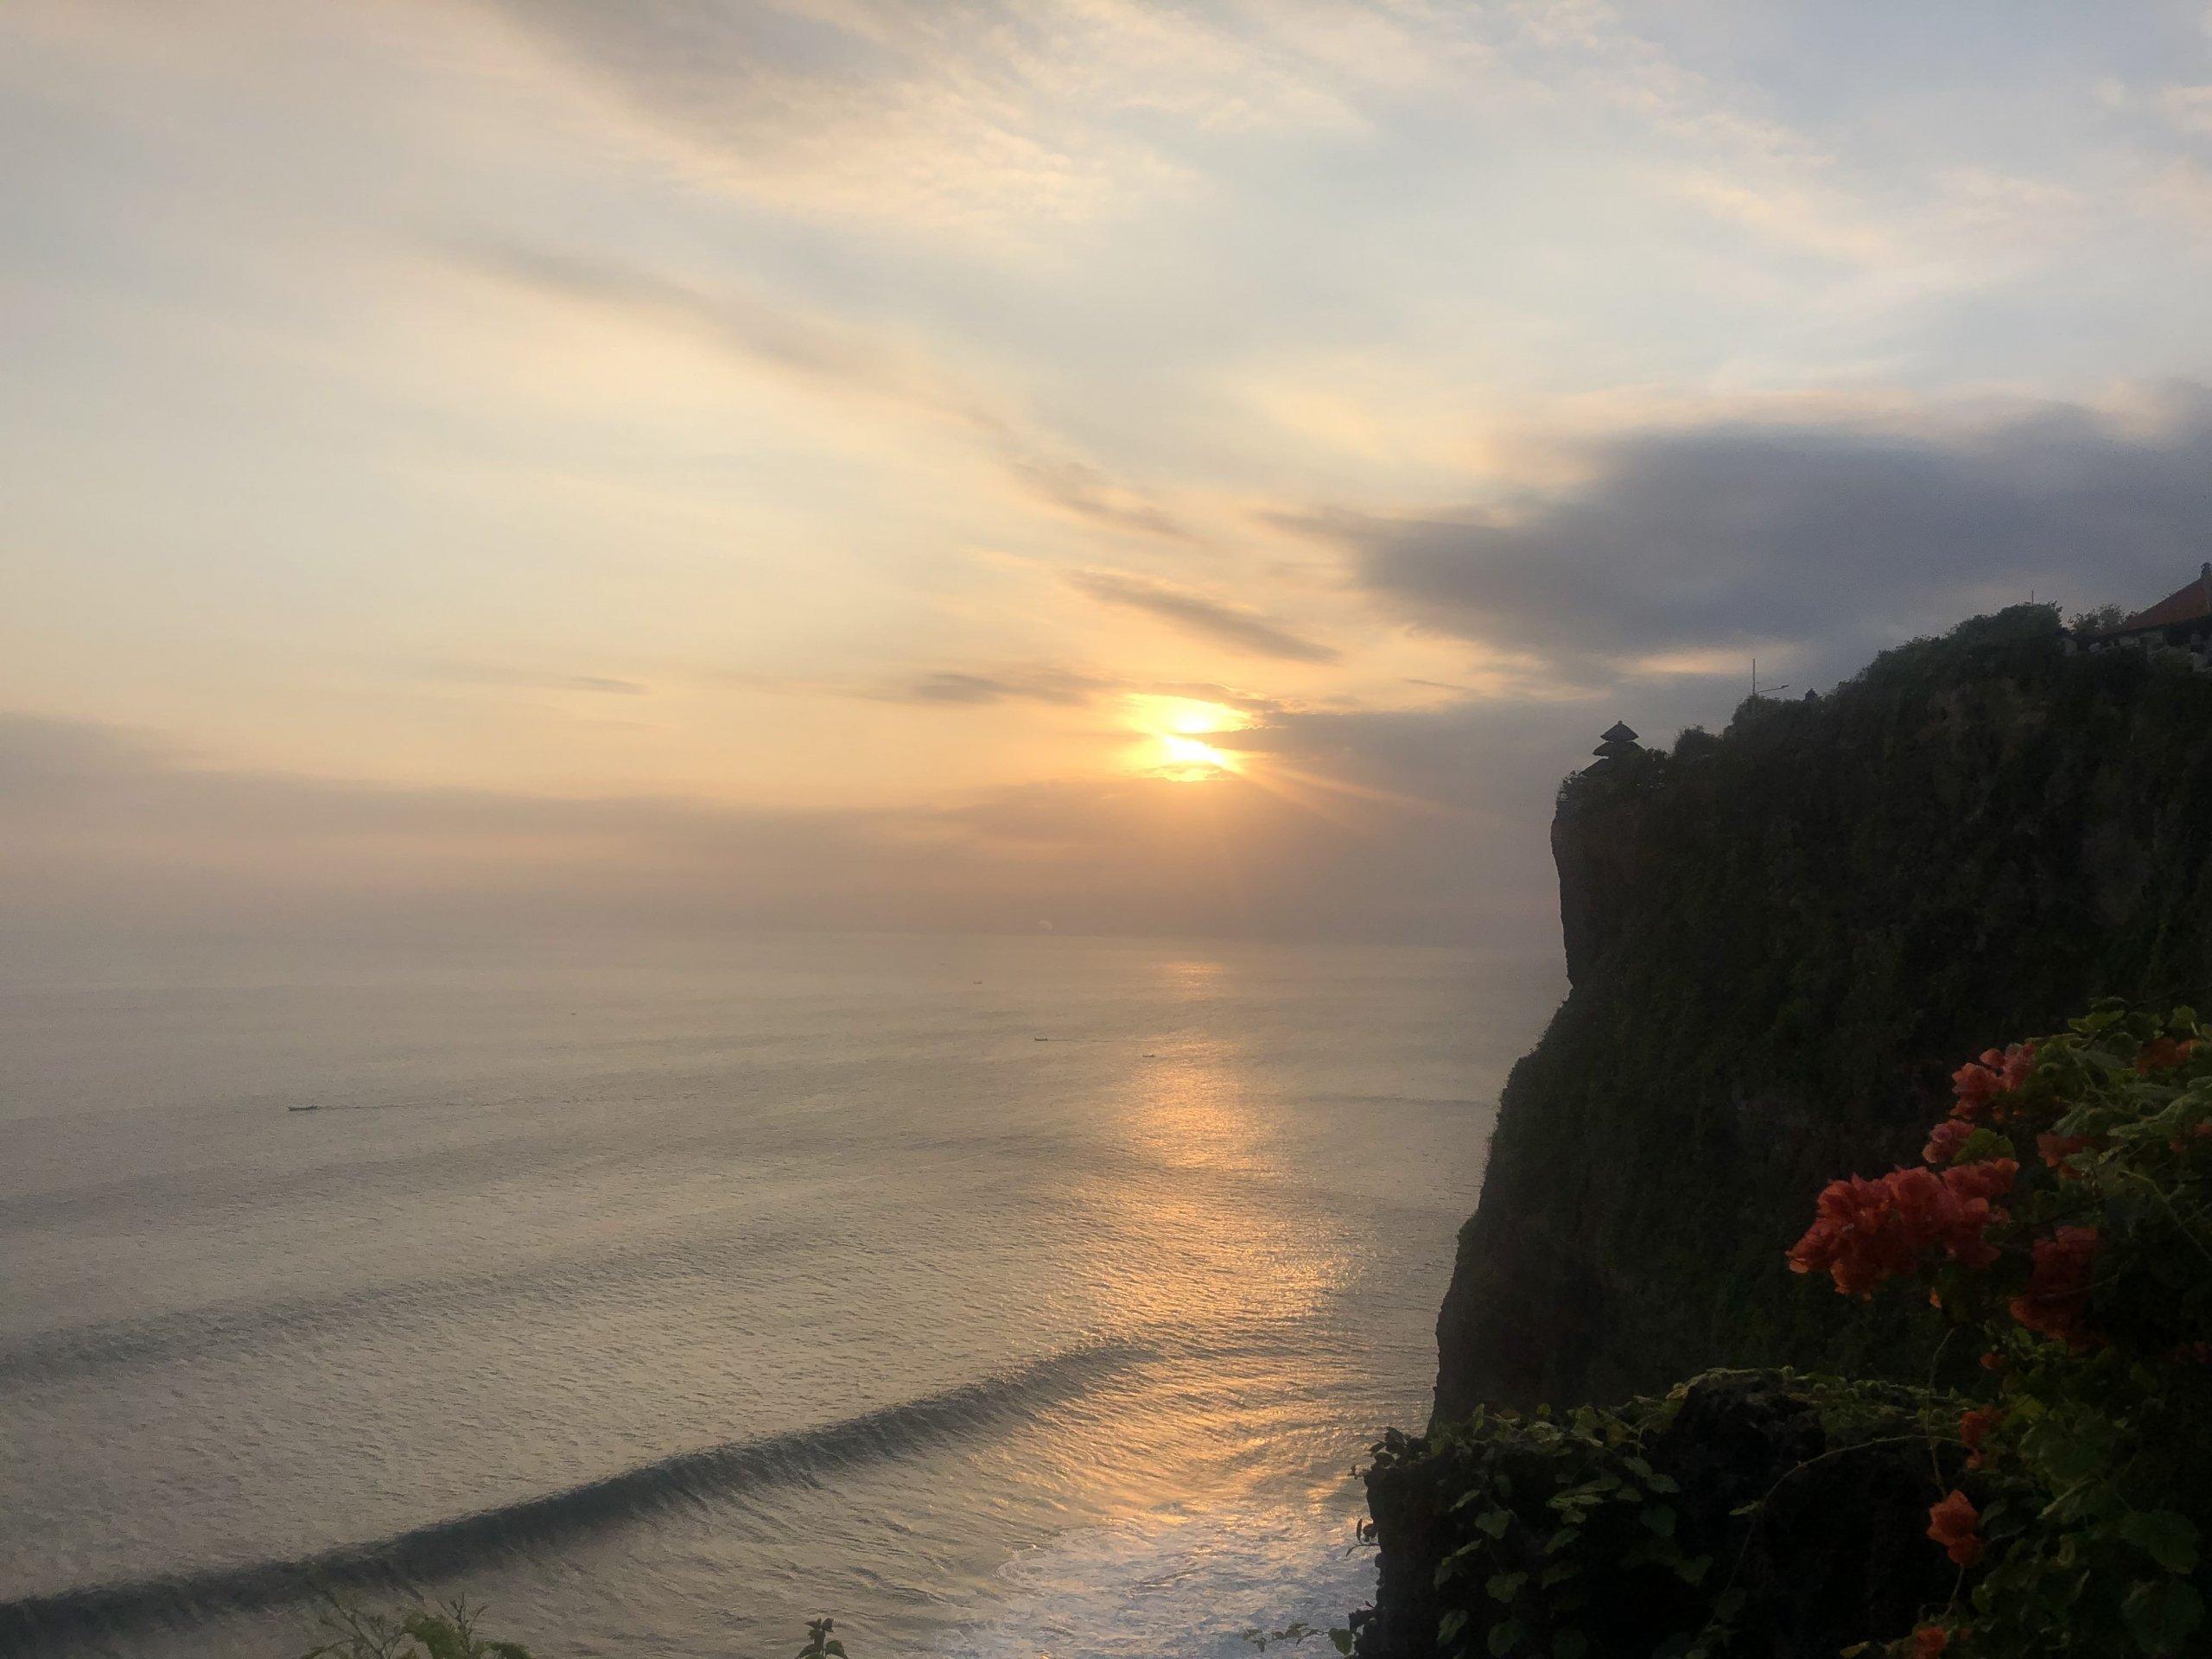 pura luhur uluwatu temple- Bali travel guide